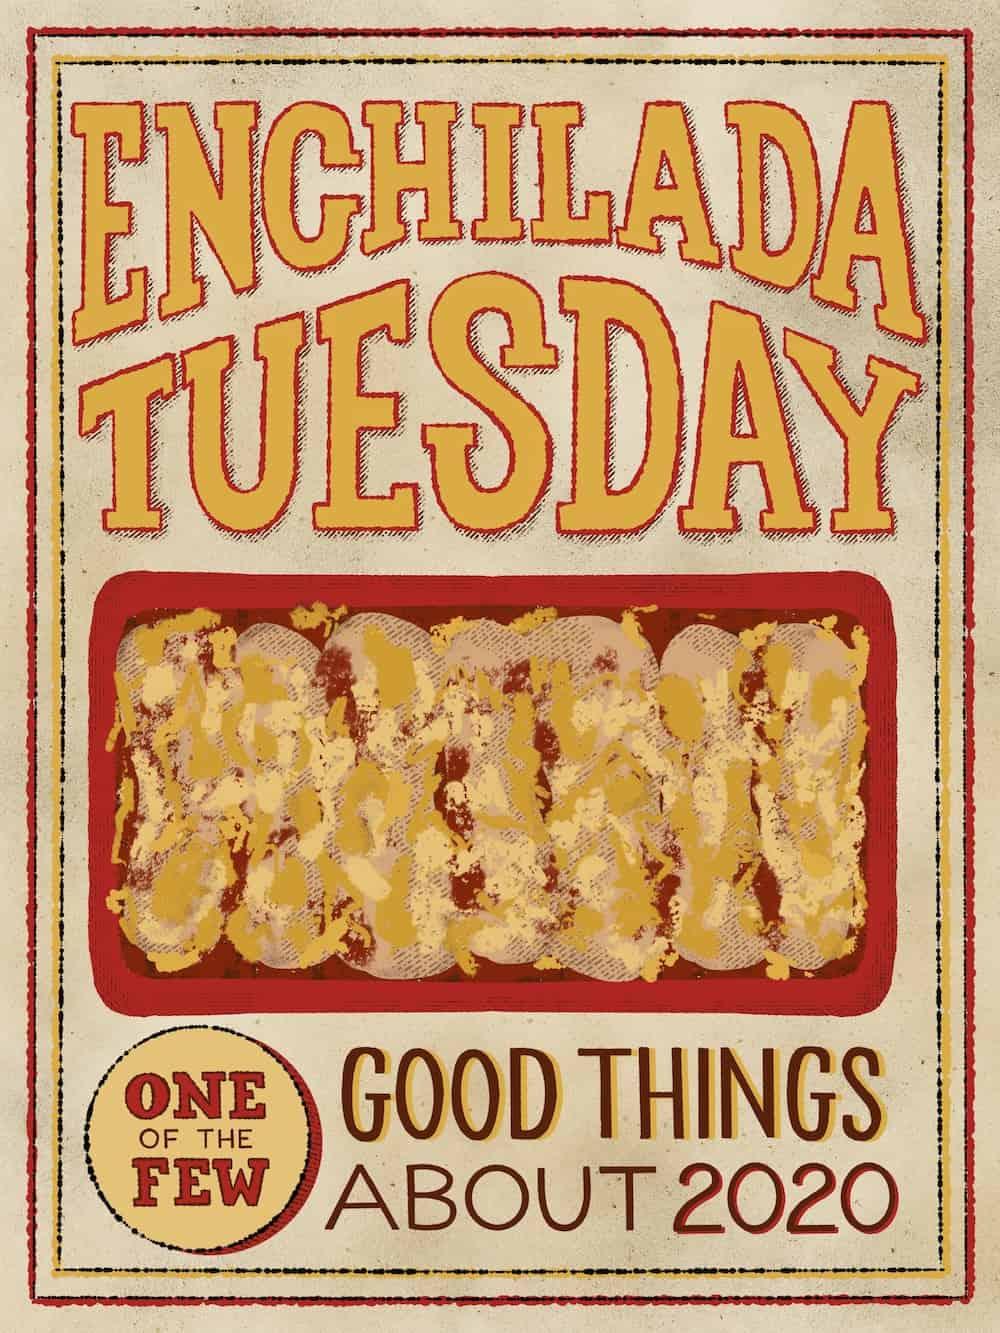 Enchilada Tuesday poster illustration